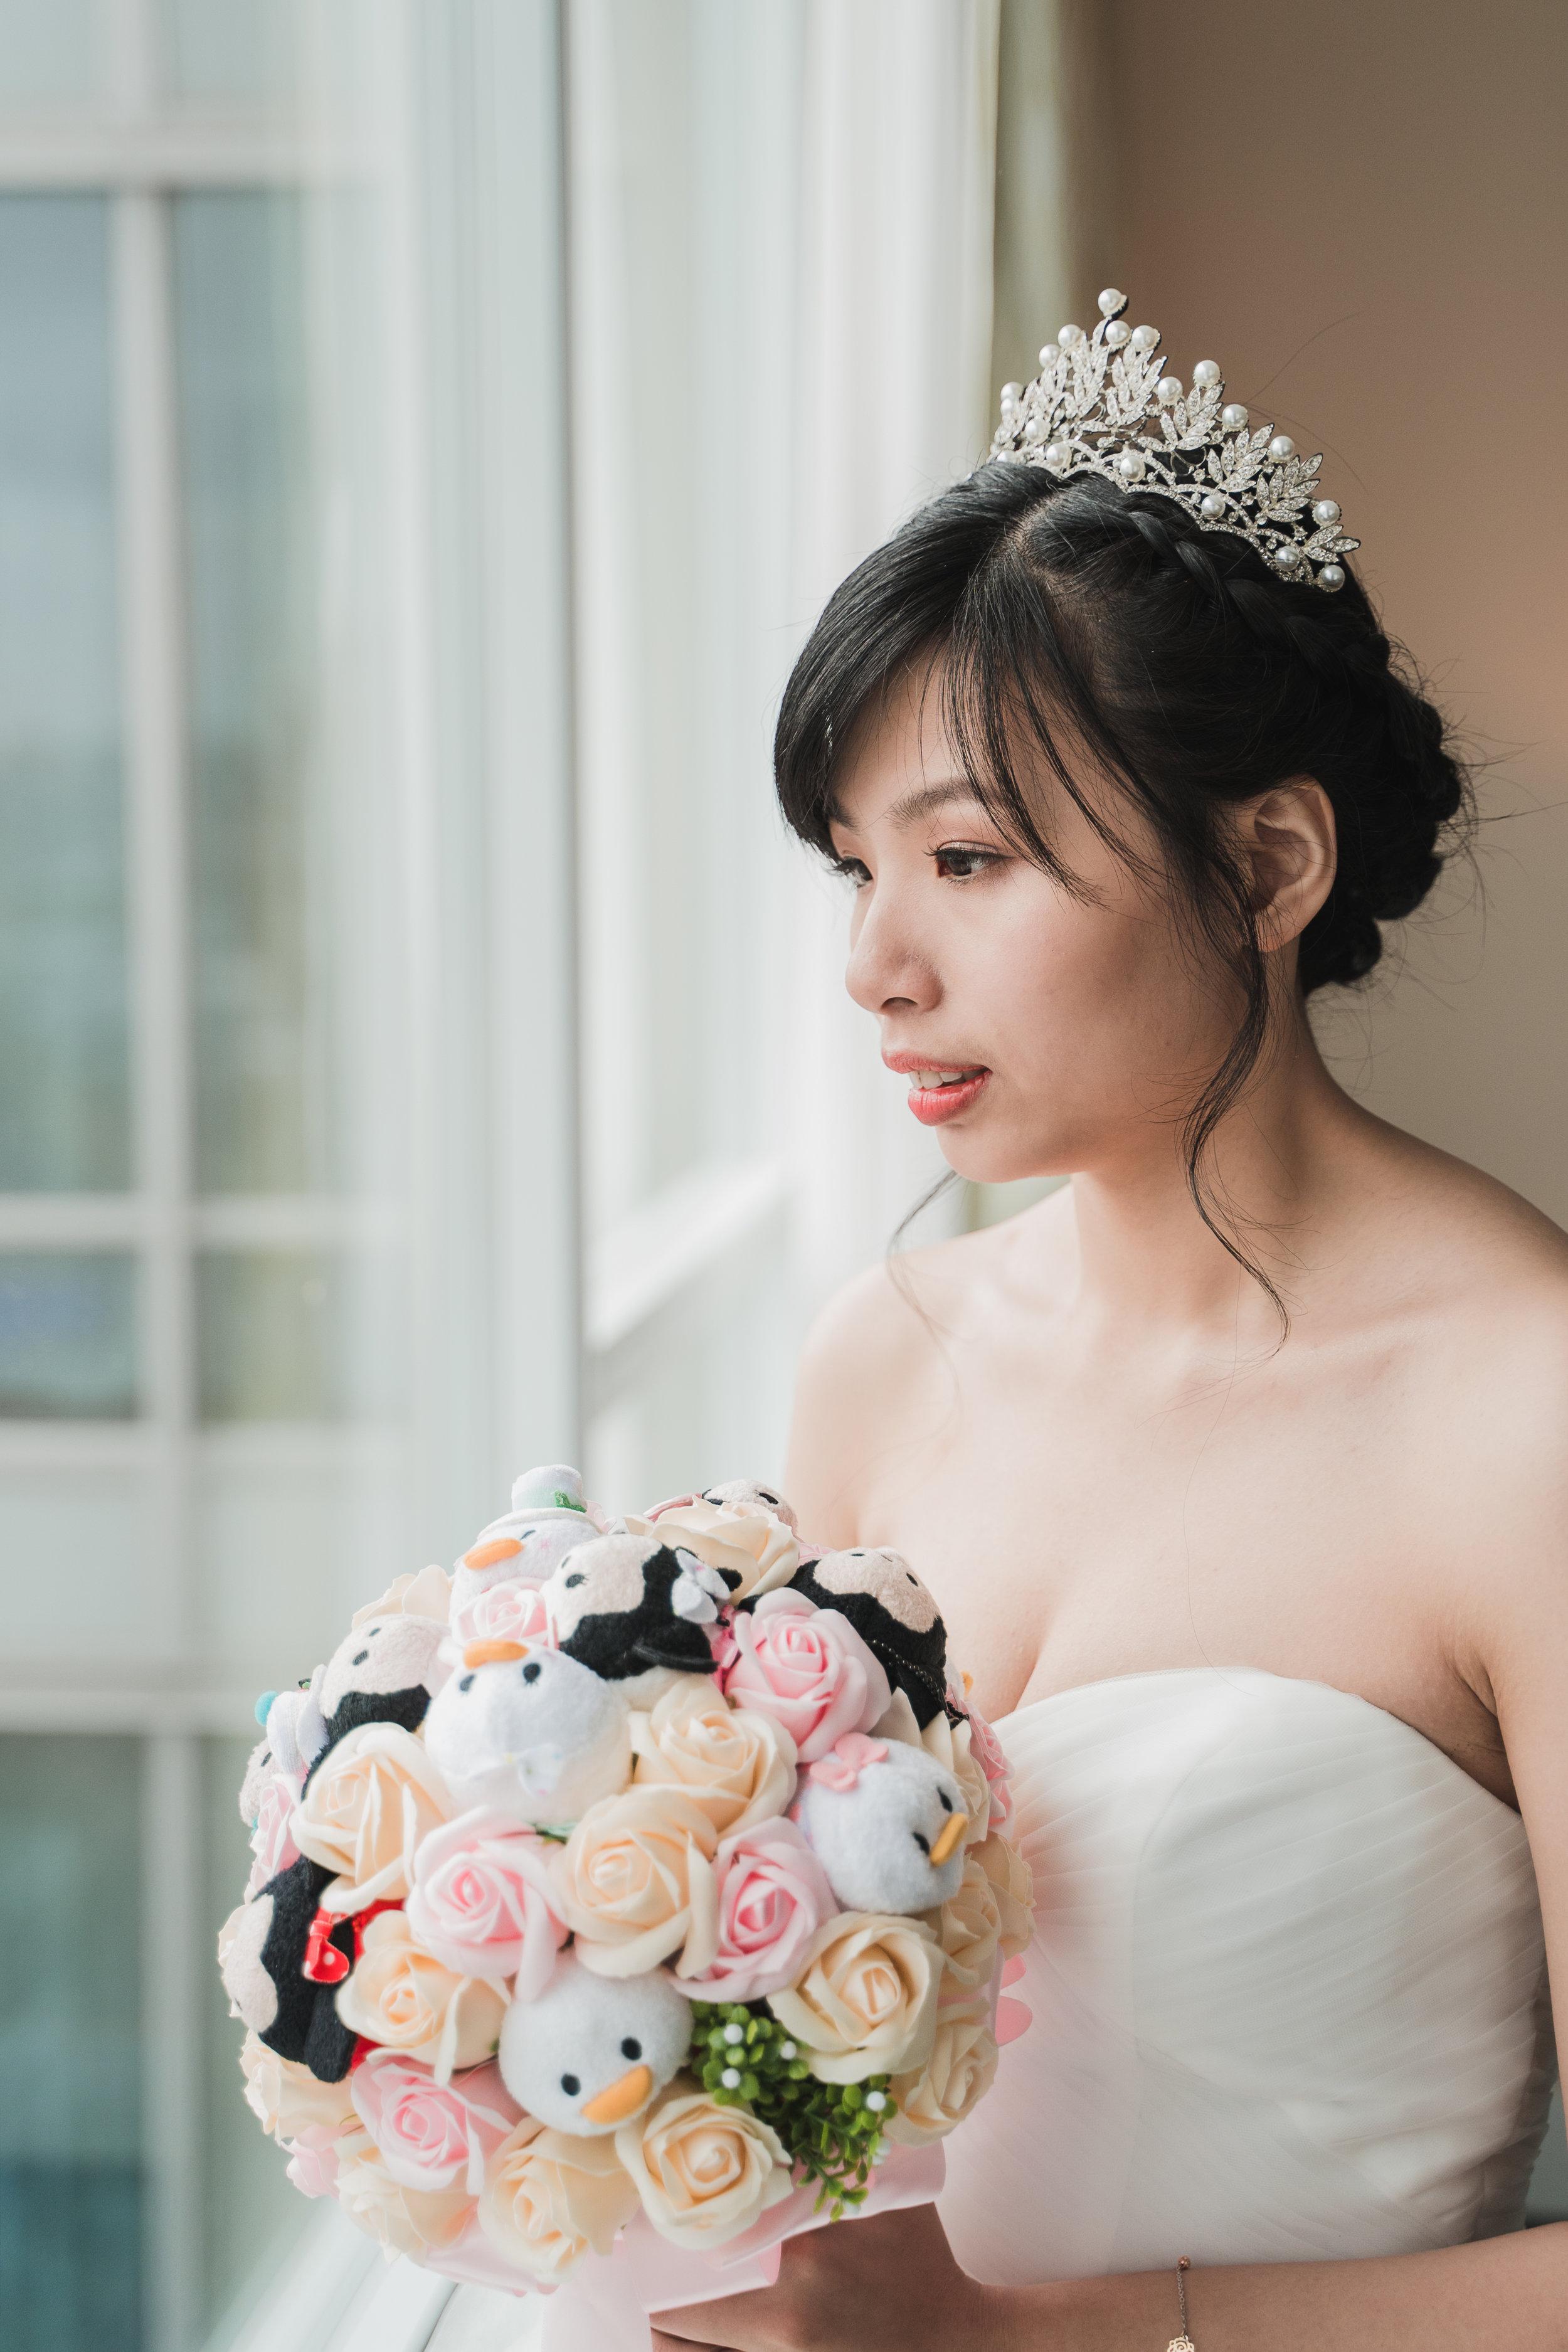 20190520 - Pamela & Matthew Wedding - 0042.jpg